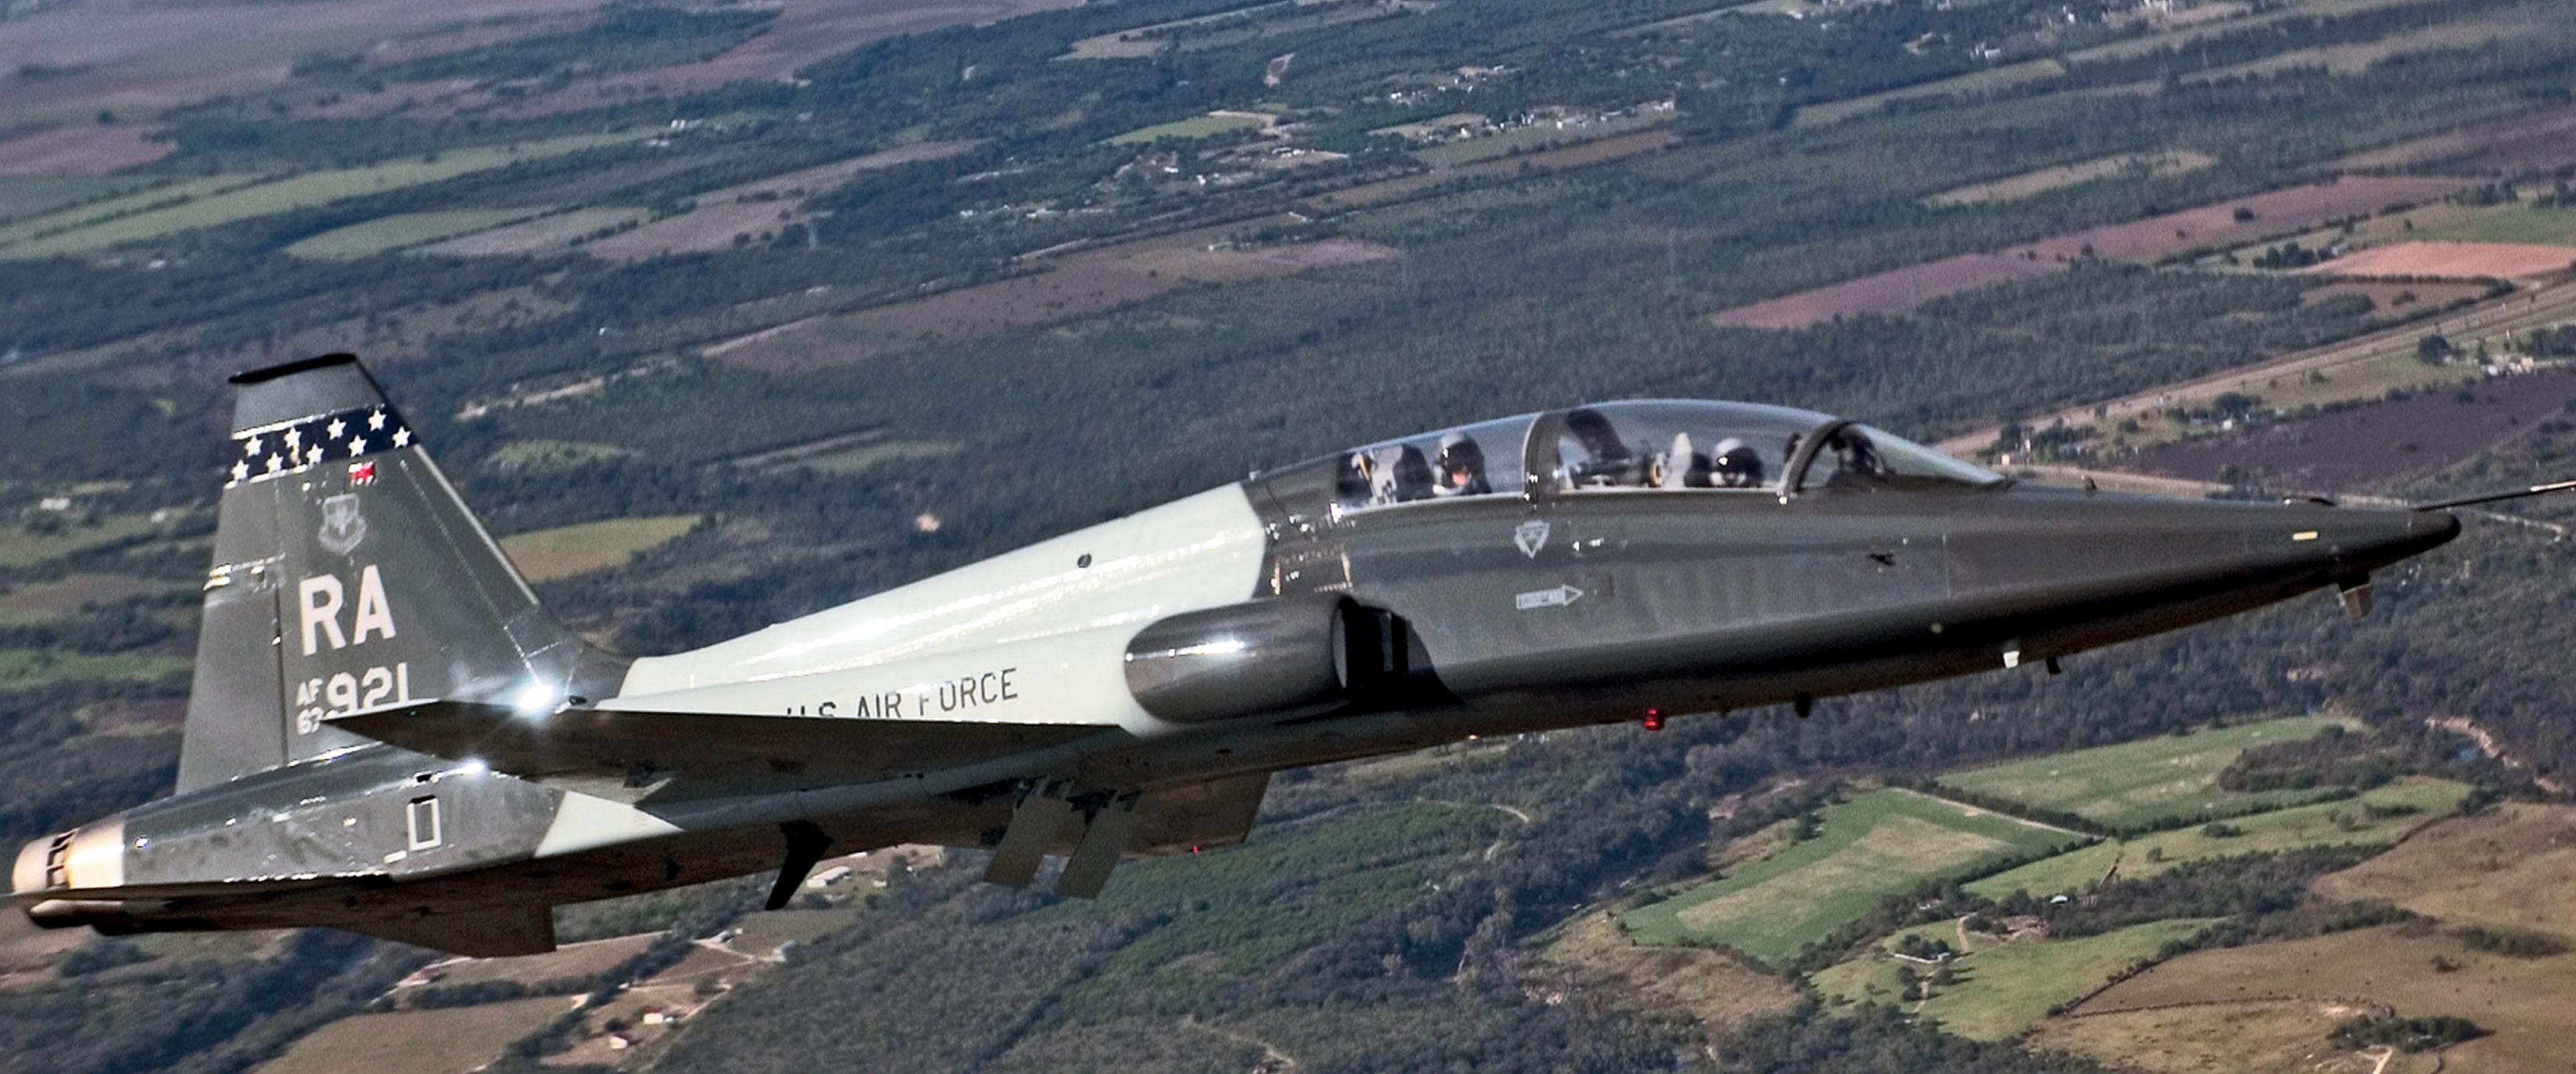 Airforce 21 Roblox T 38 Talon U S Air Force Fact Sheet Display